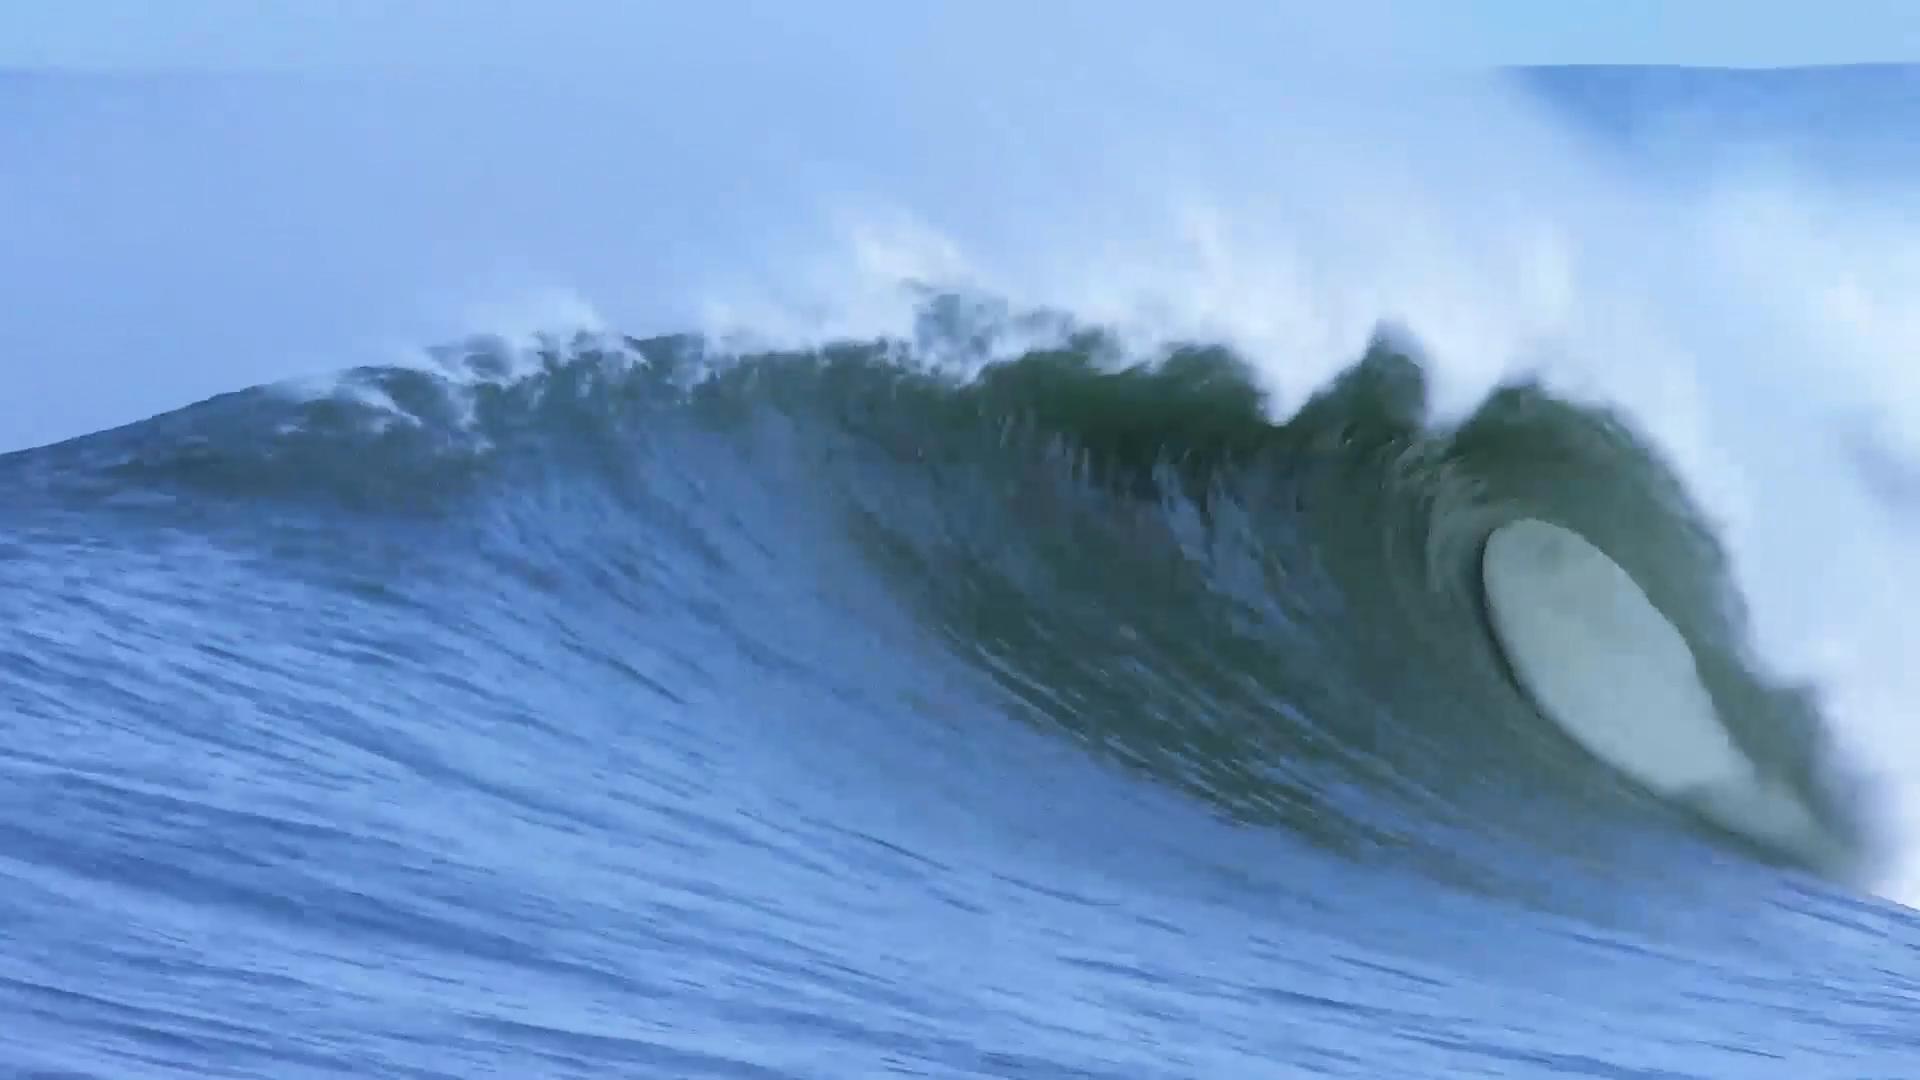 Big Wave in the Basque Country Ingles, with Laurels. Azkena Carrascon.MP4.Imagen fija027.jpg